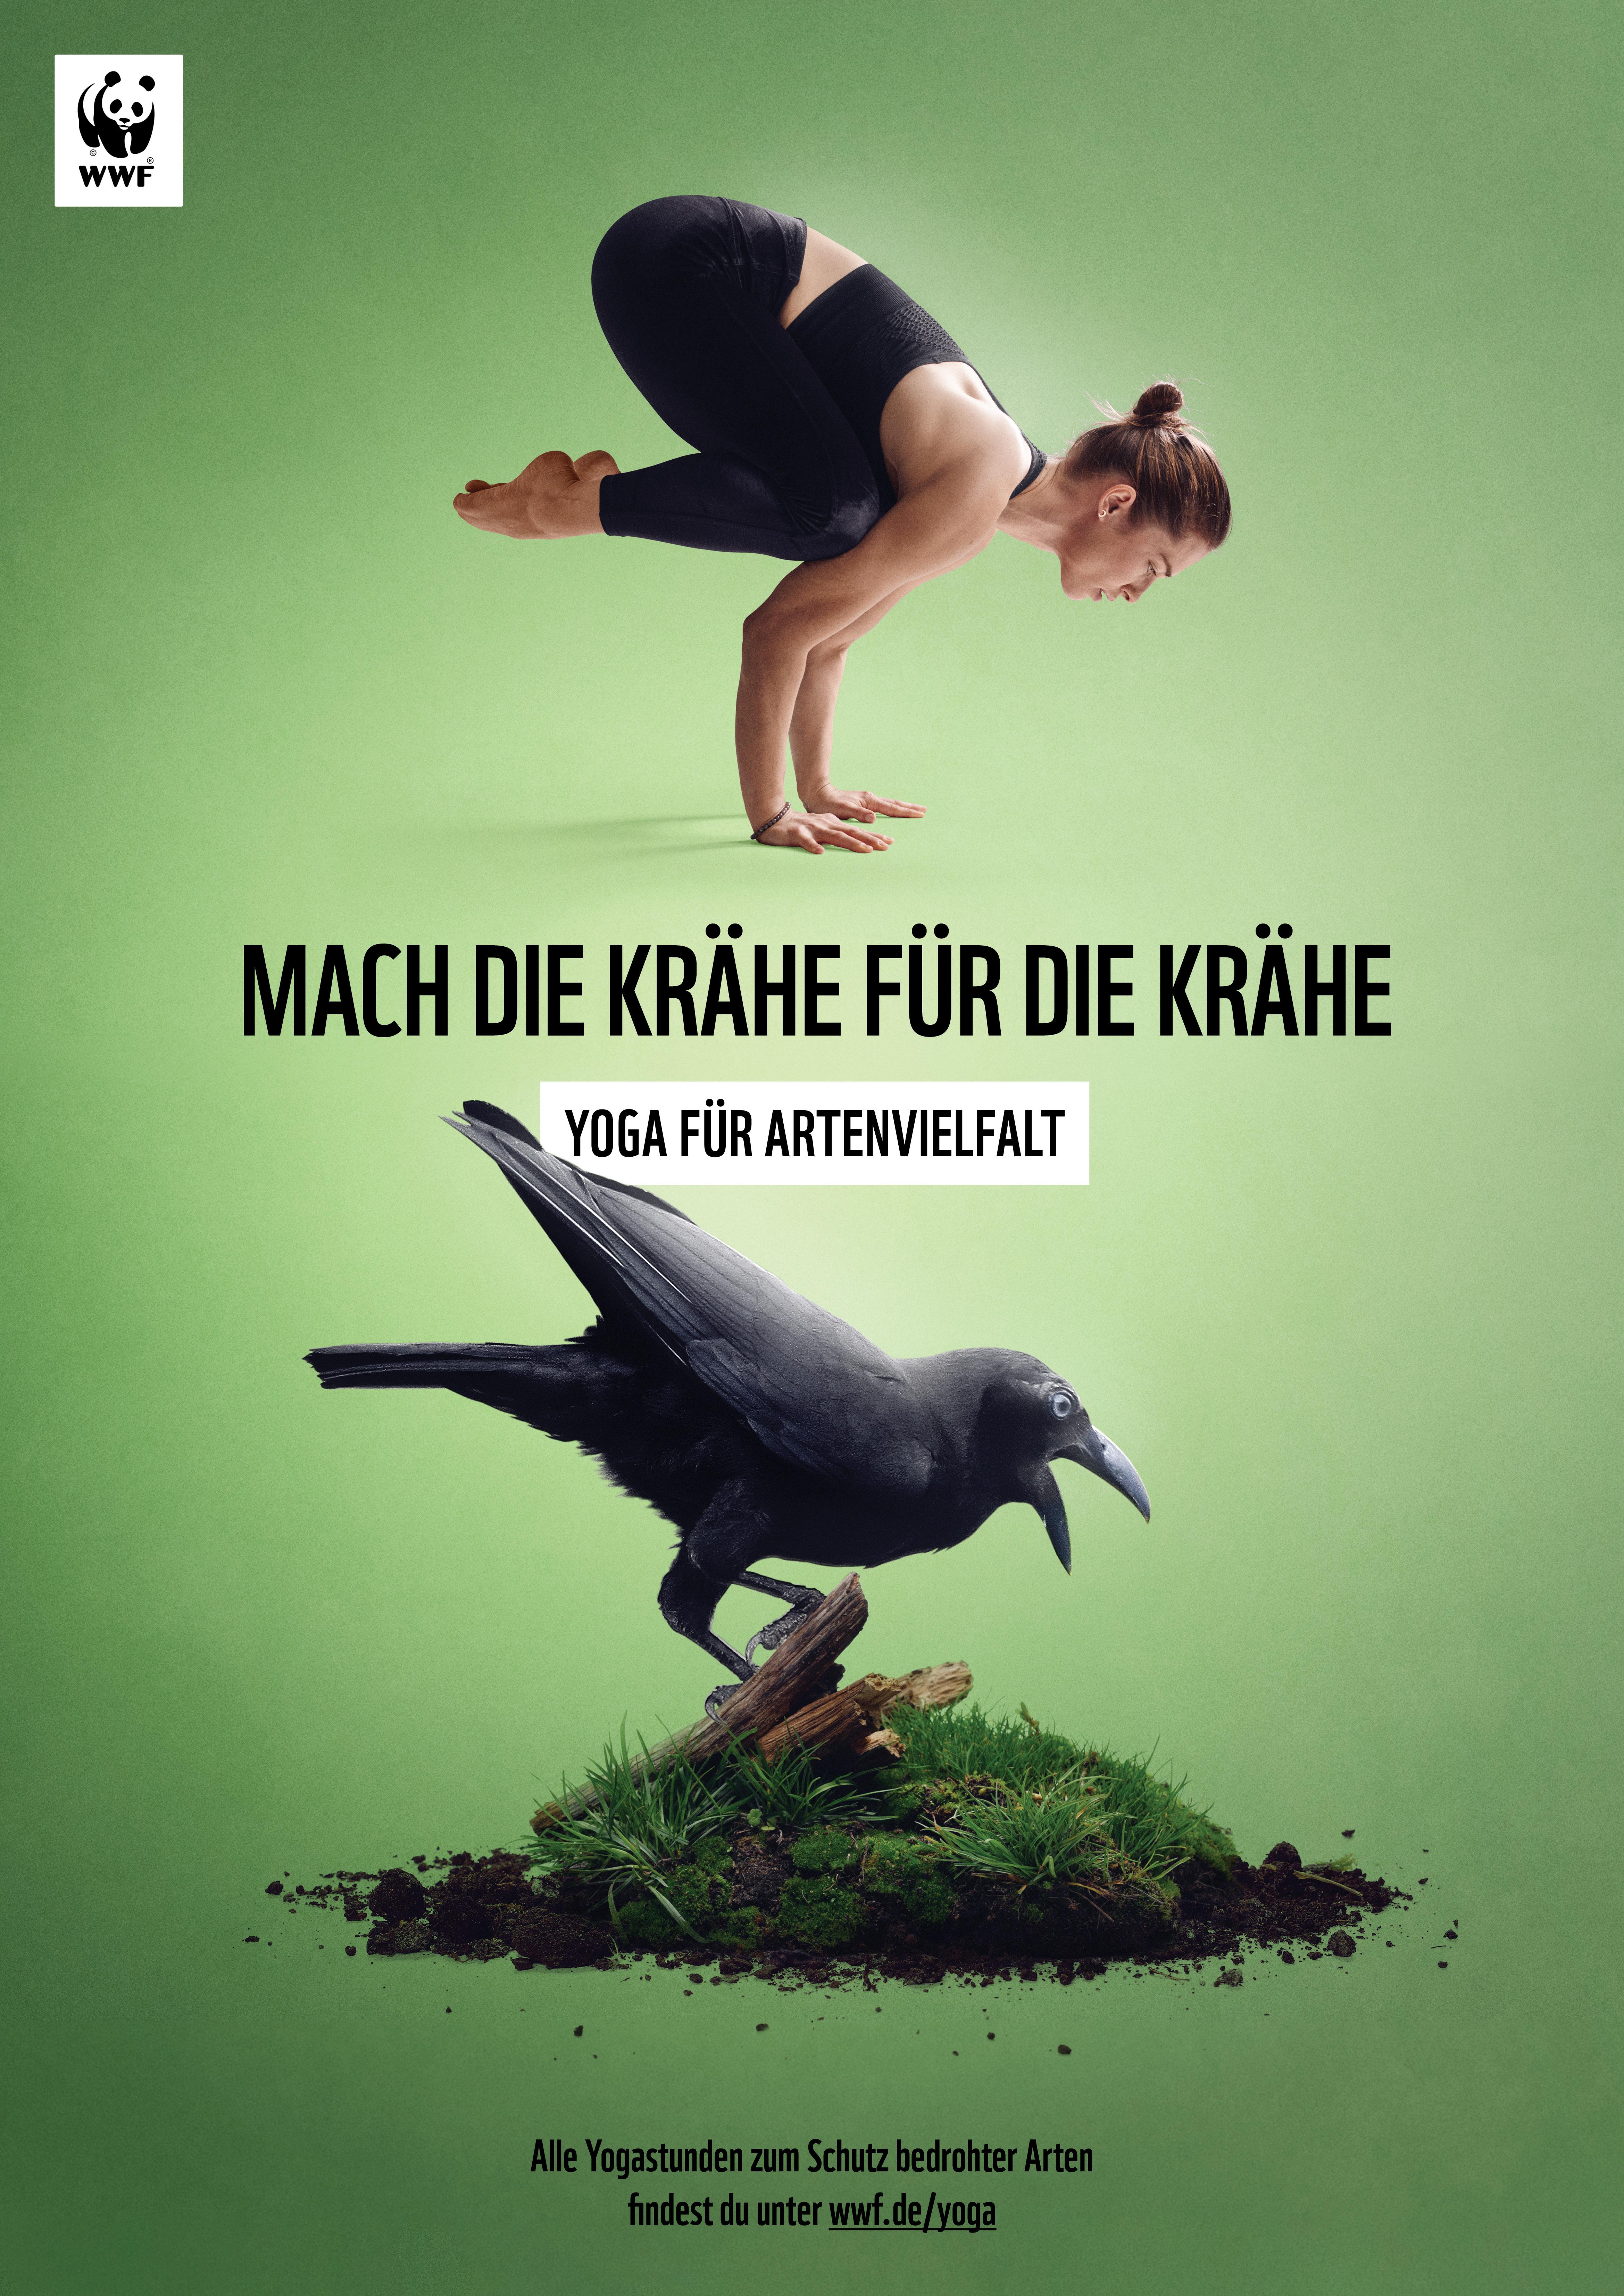 WWF Yoga für Artenvielfalt Banggai Krähe